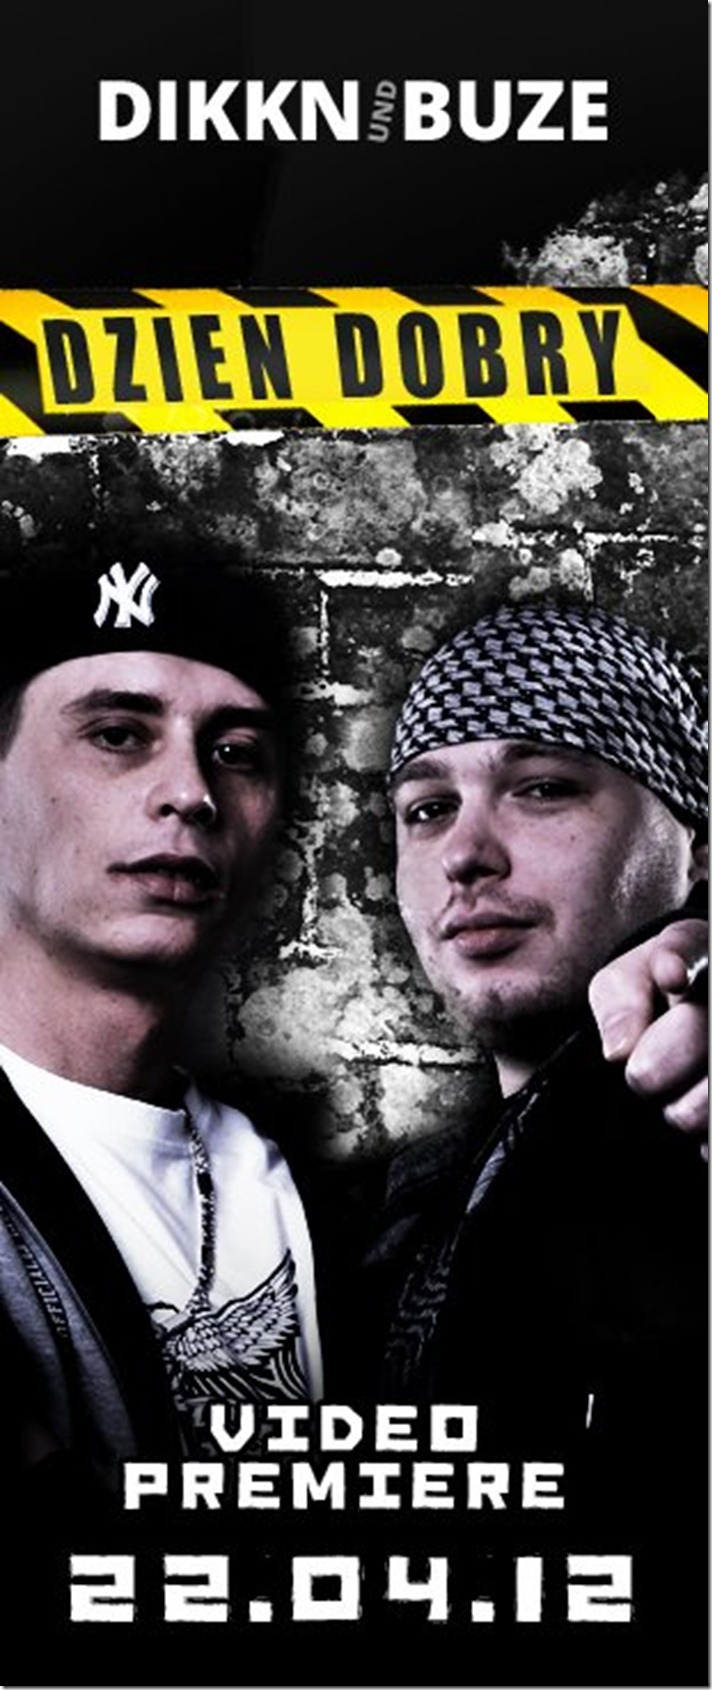 Dikkn-Buze-SirPreiss-Dzien-Dobry-Musikvideo